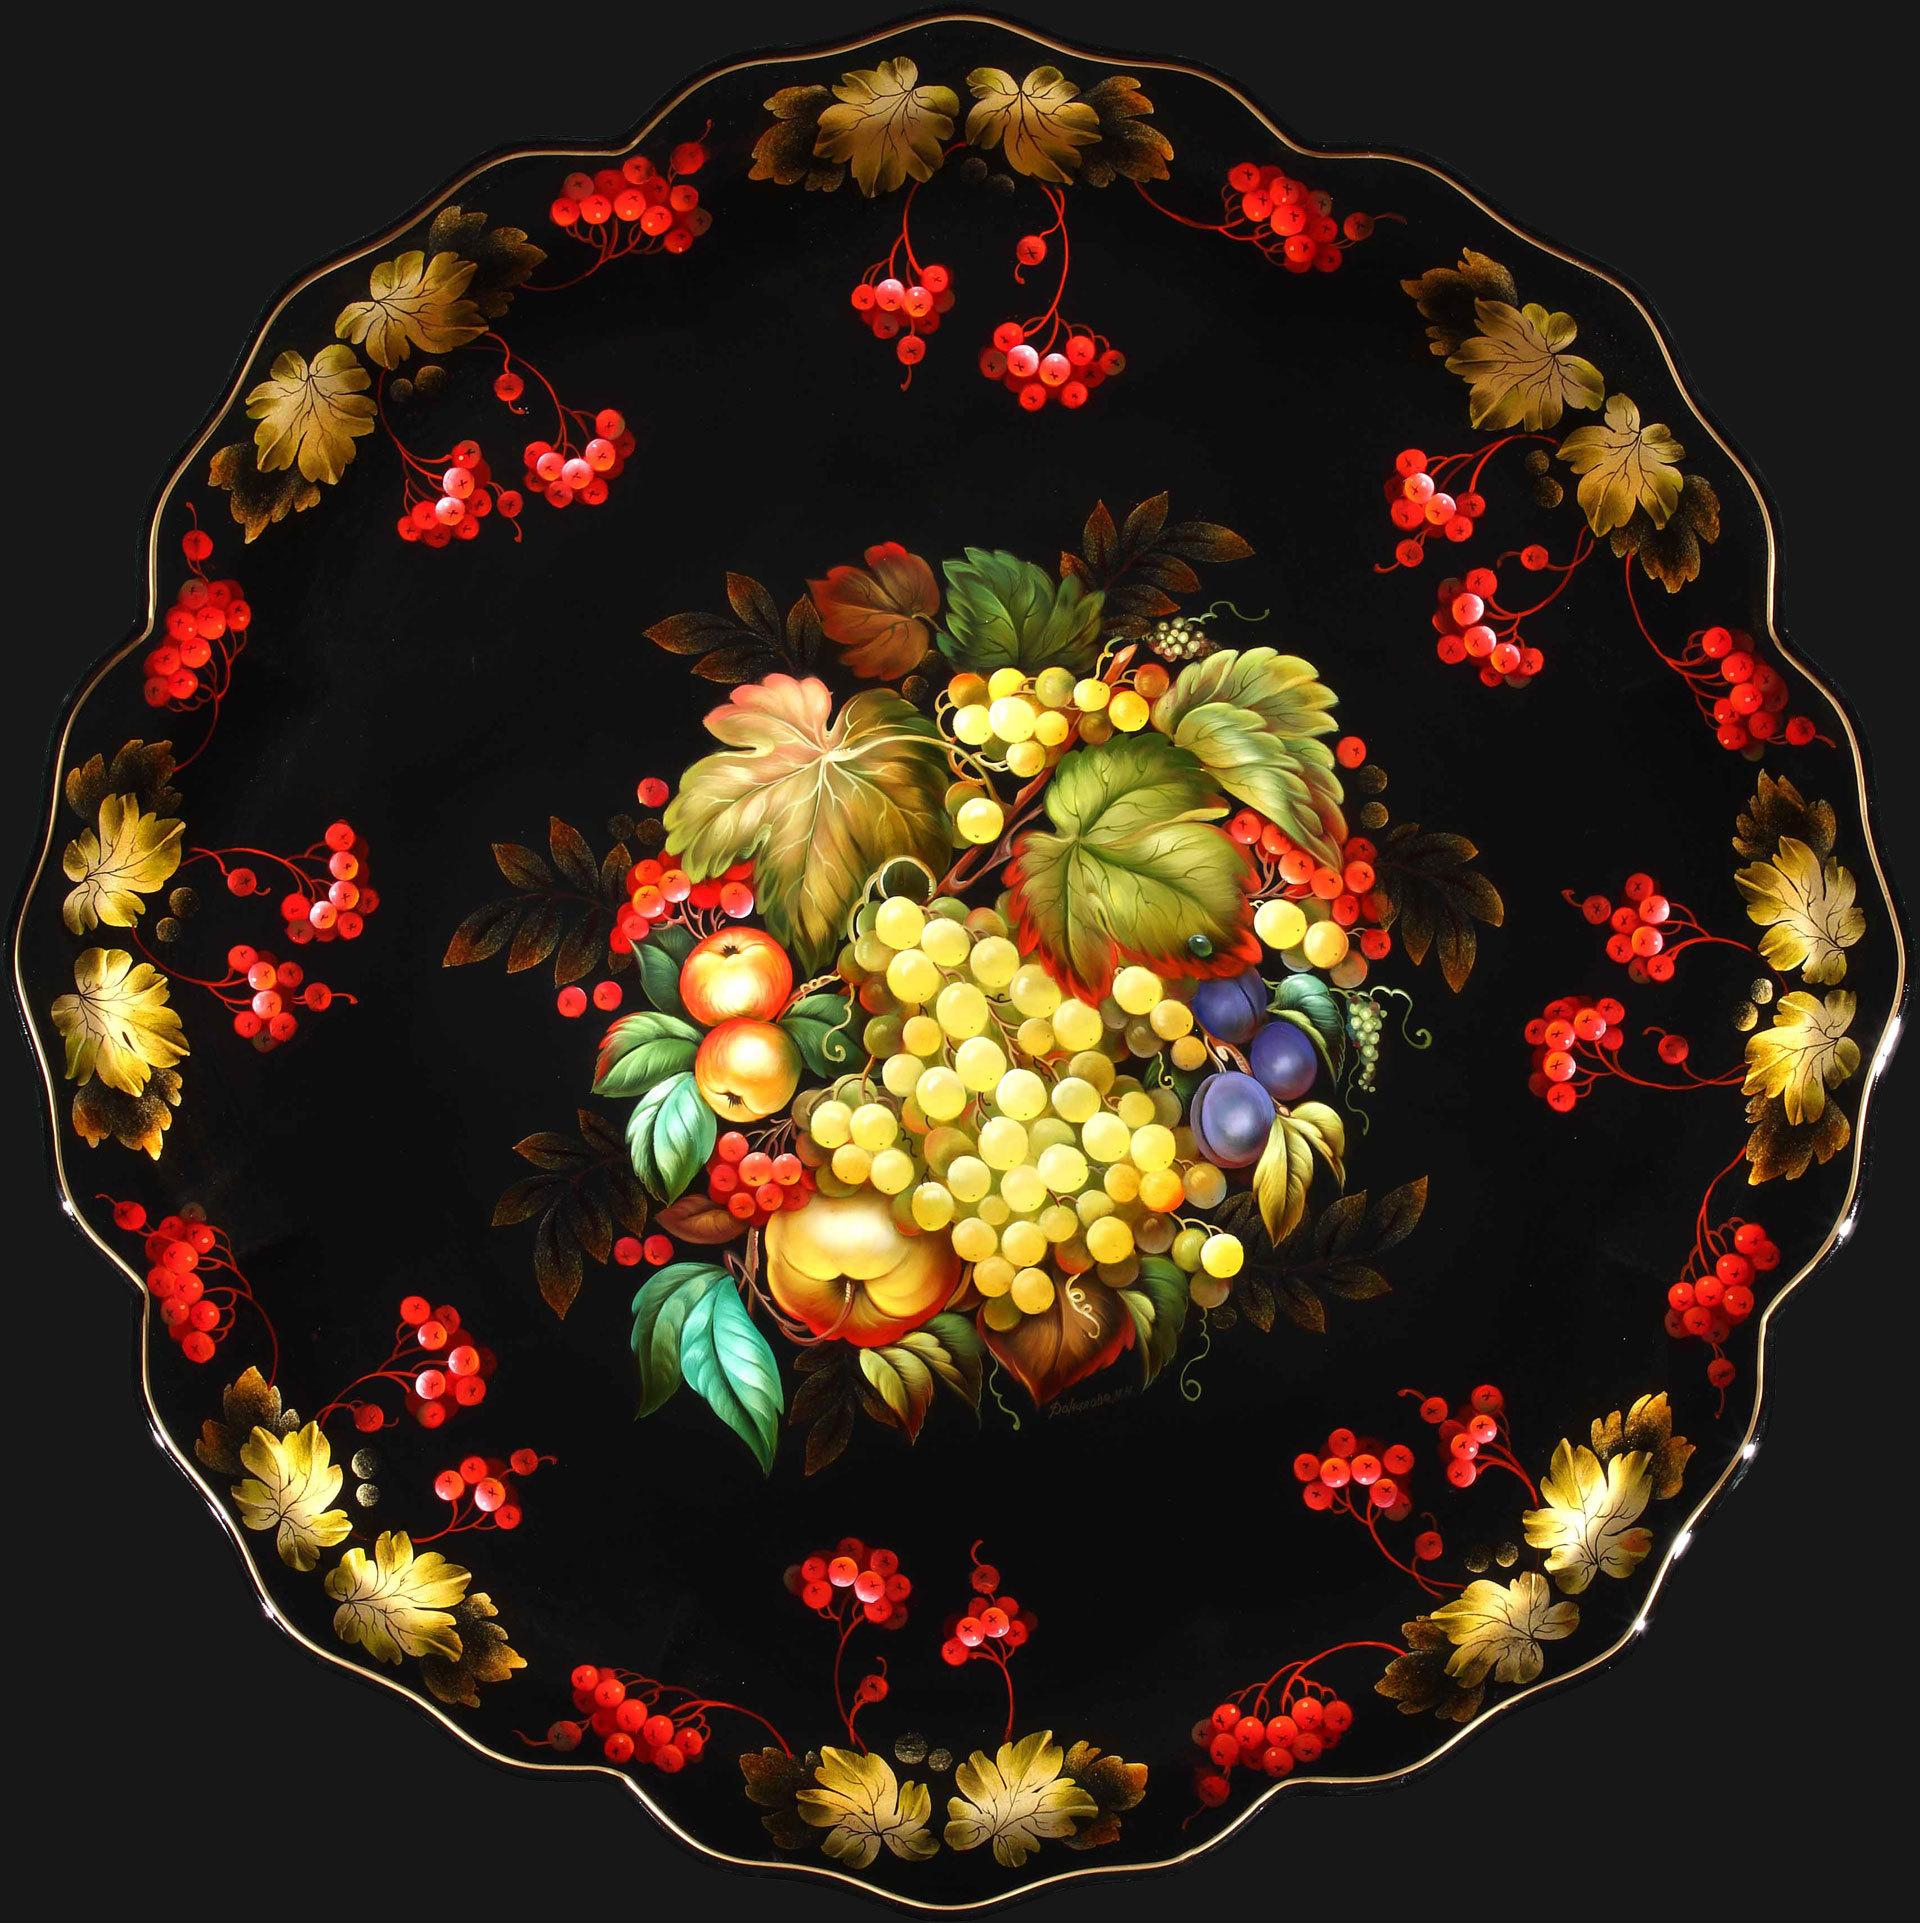 Калина и фрукт